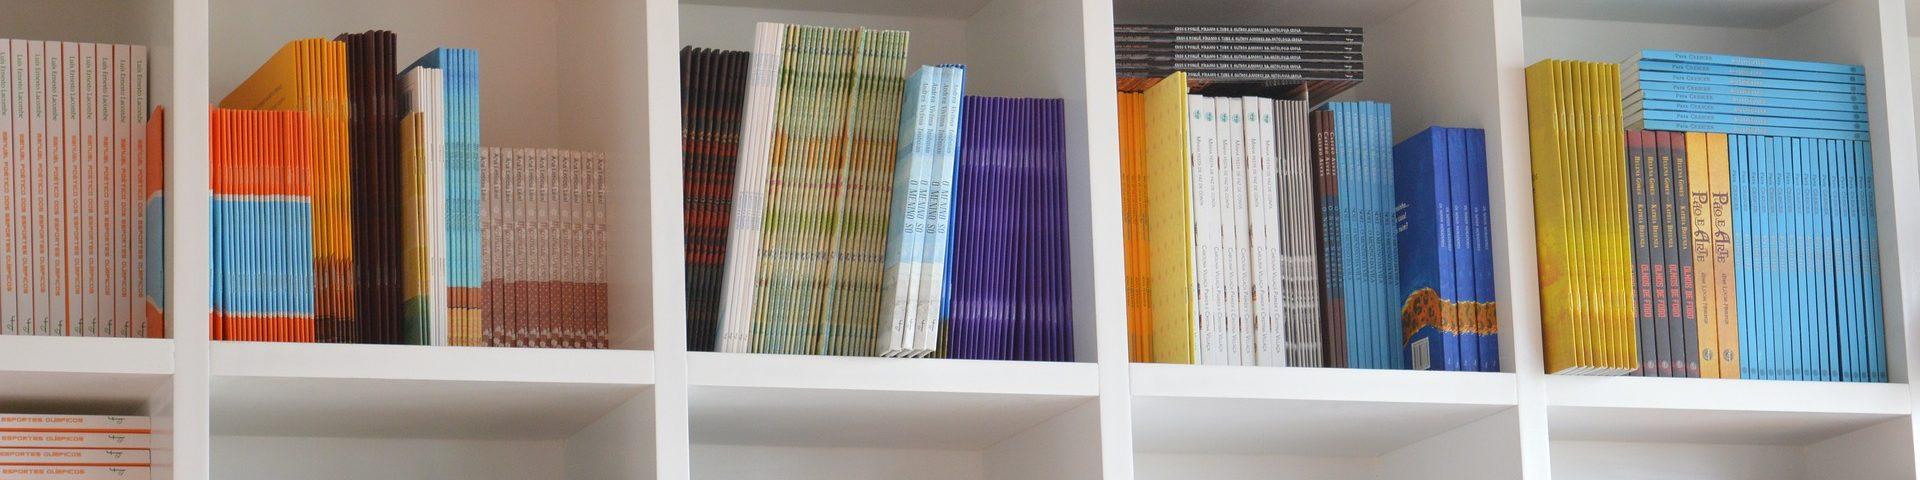 books-1643106_1920